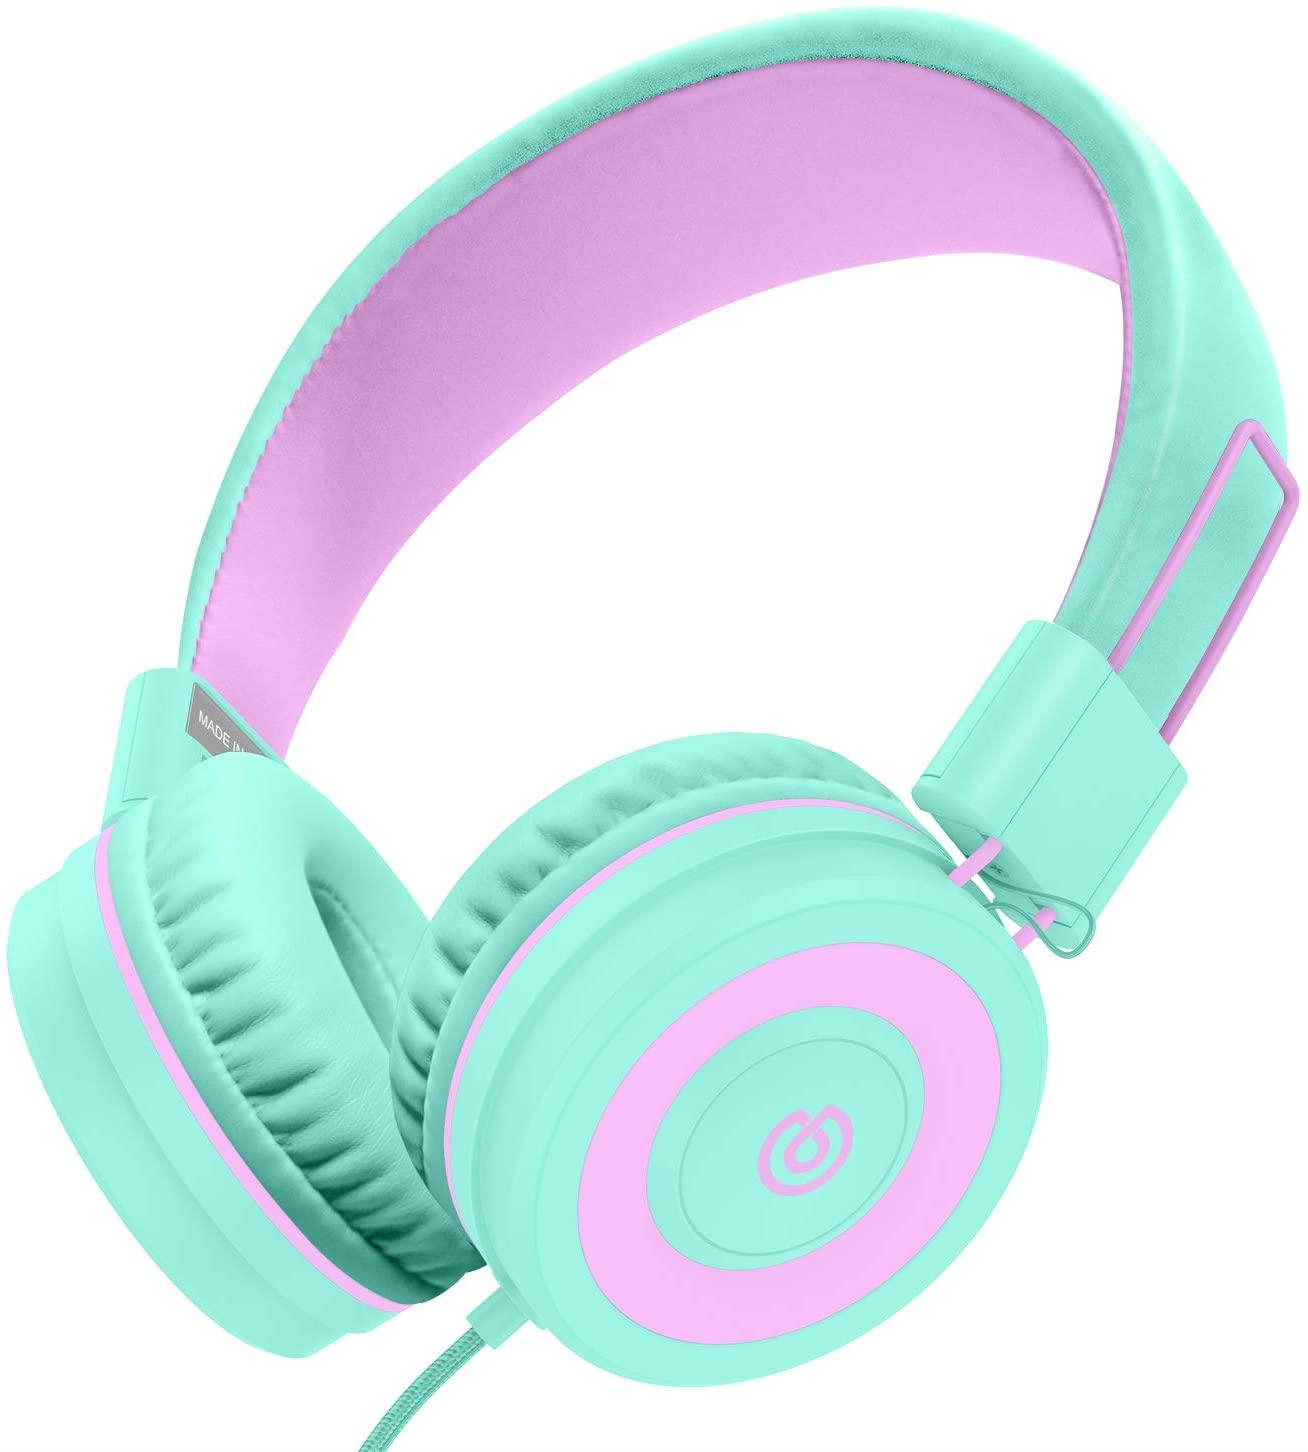 Kids Headphones,Besom i66 Headphones for Girls- Wired Headphones for Kids, Adjustable Foldable Tangle-Free Cord 3.5mm Jack on Ear Headset for iPad Tablet Kindle Airplane School (Green)